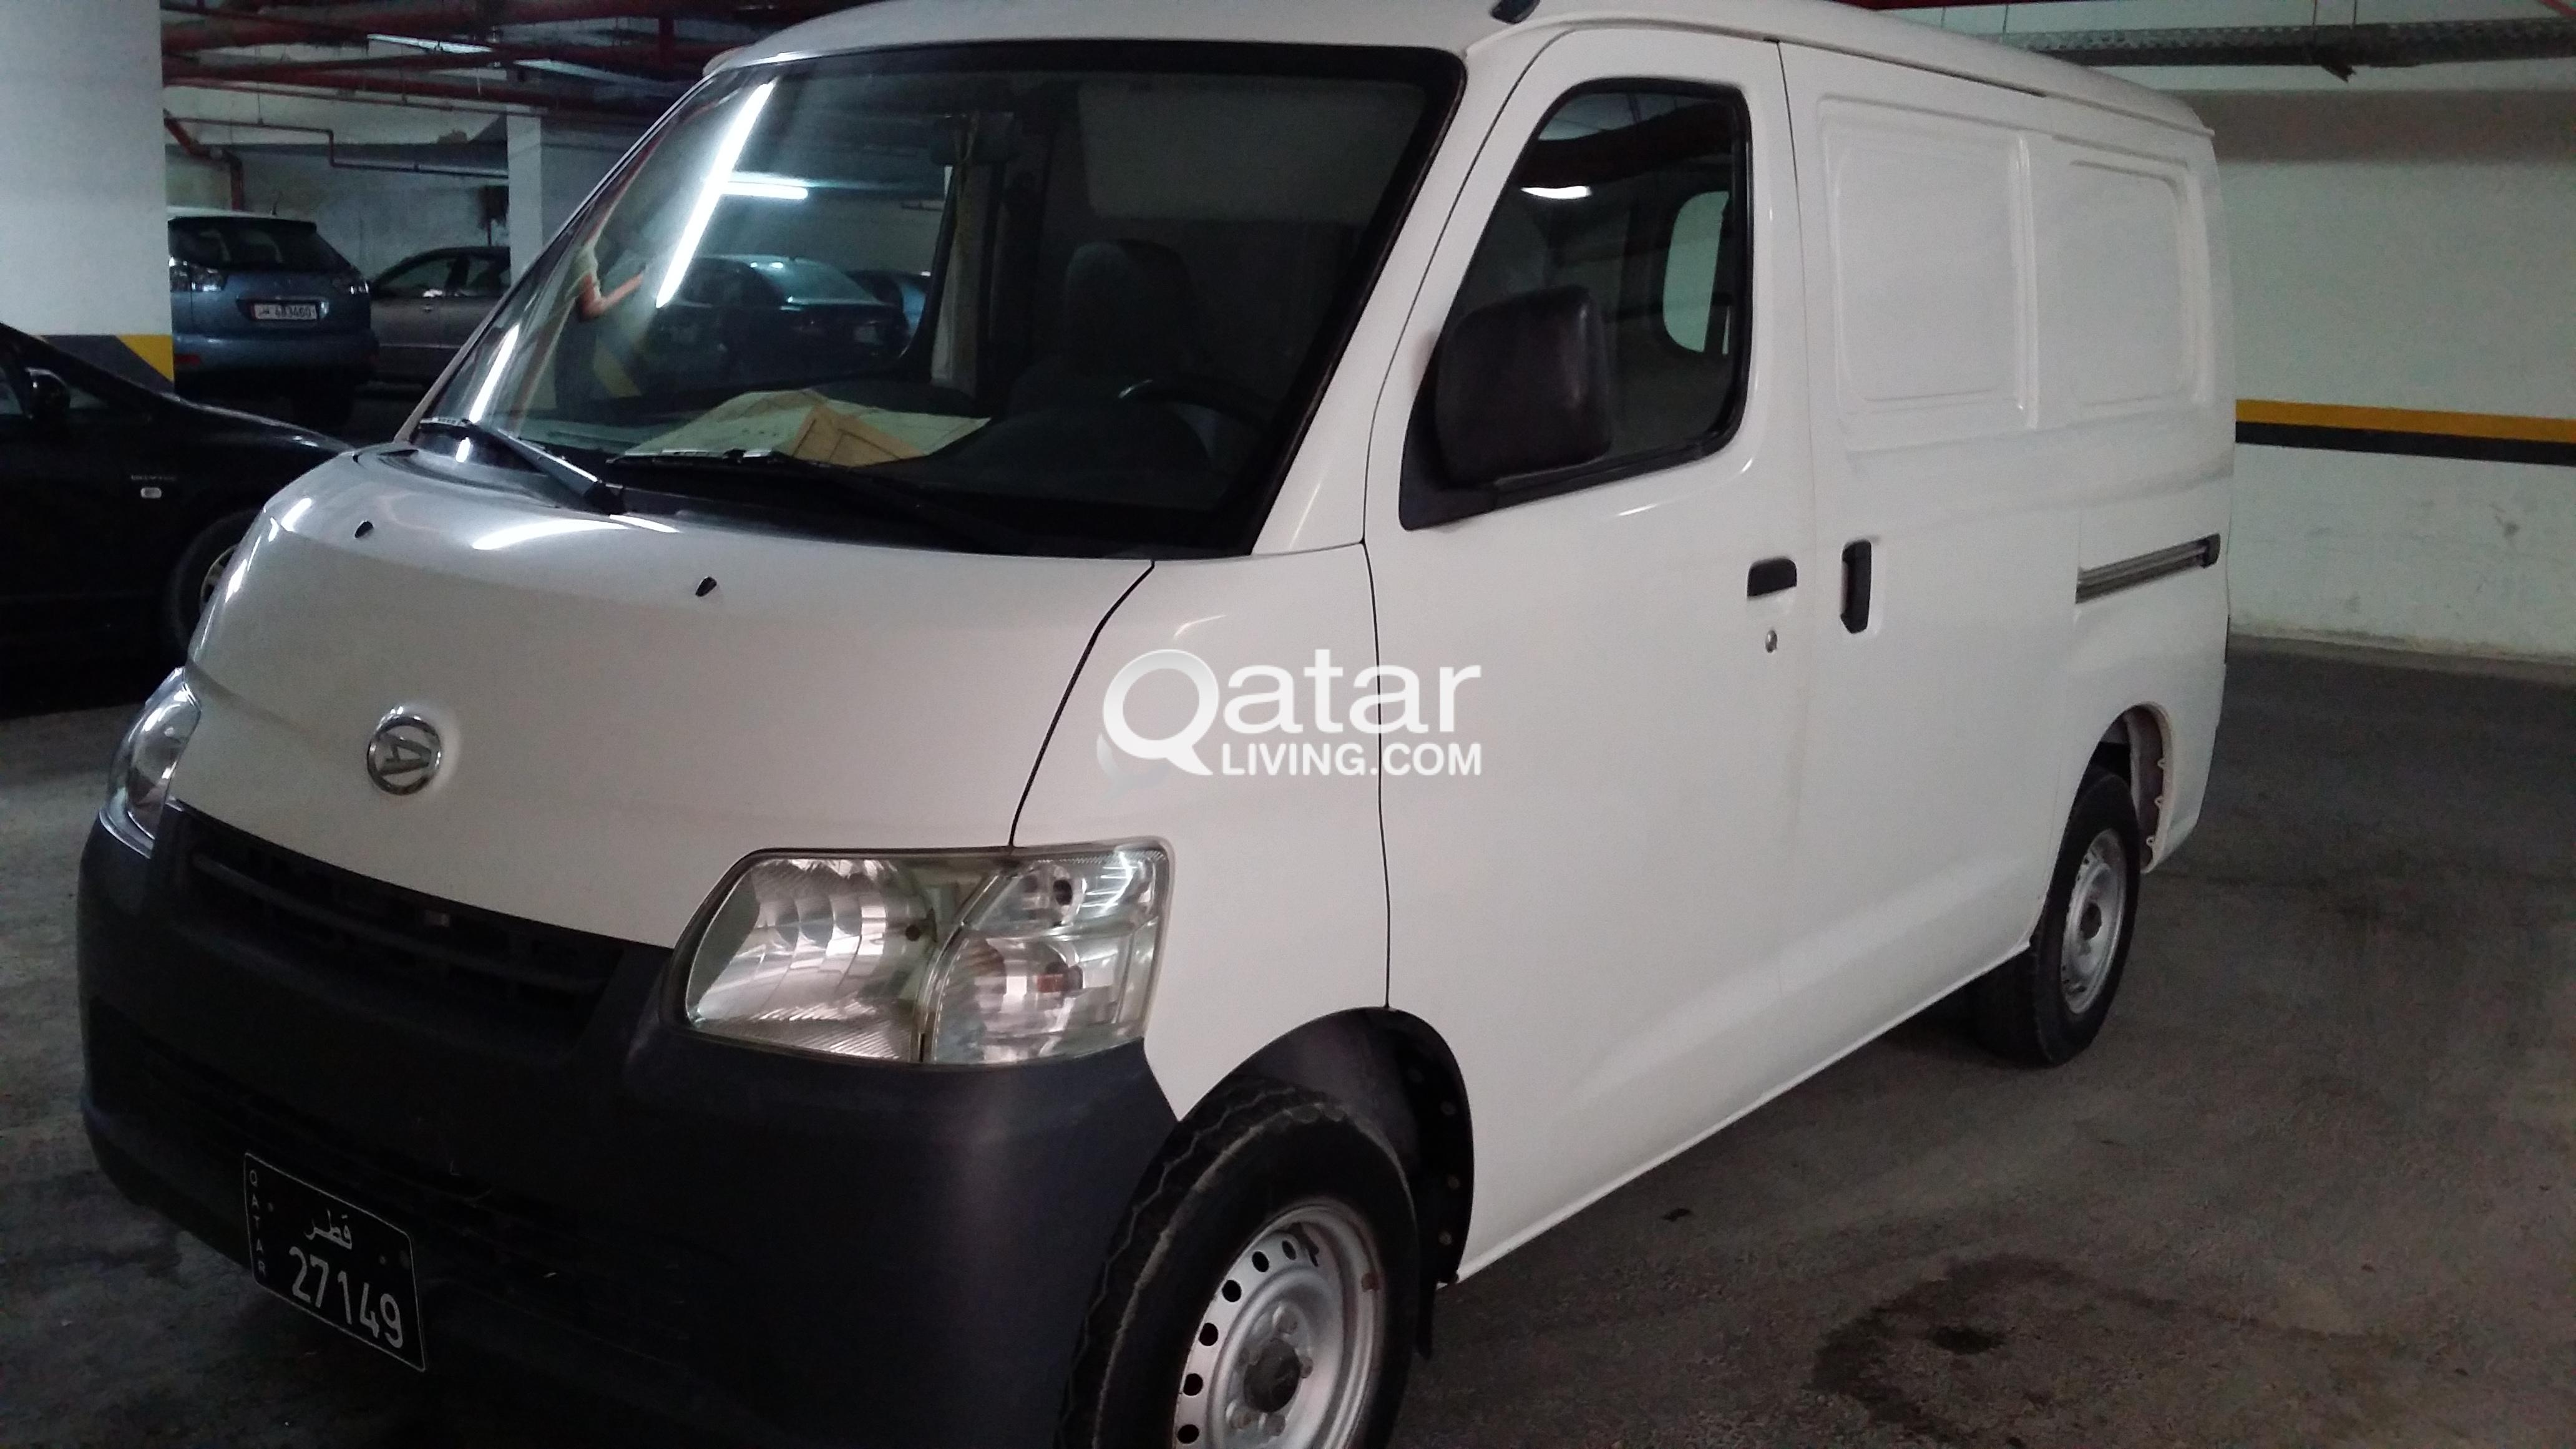 Daihatsu Grand Max 2011 For Sale Qatar Living Head Lamp Granmax Title